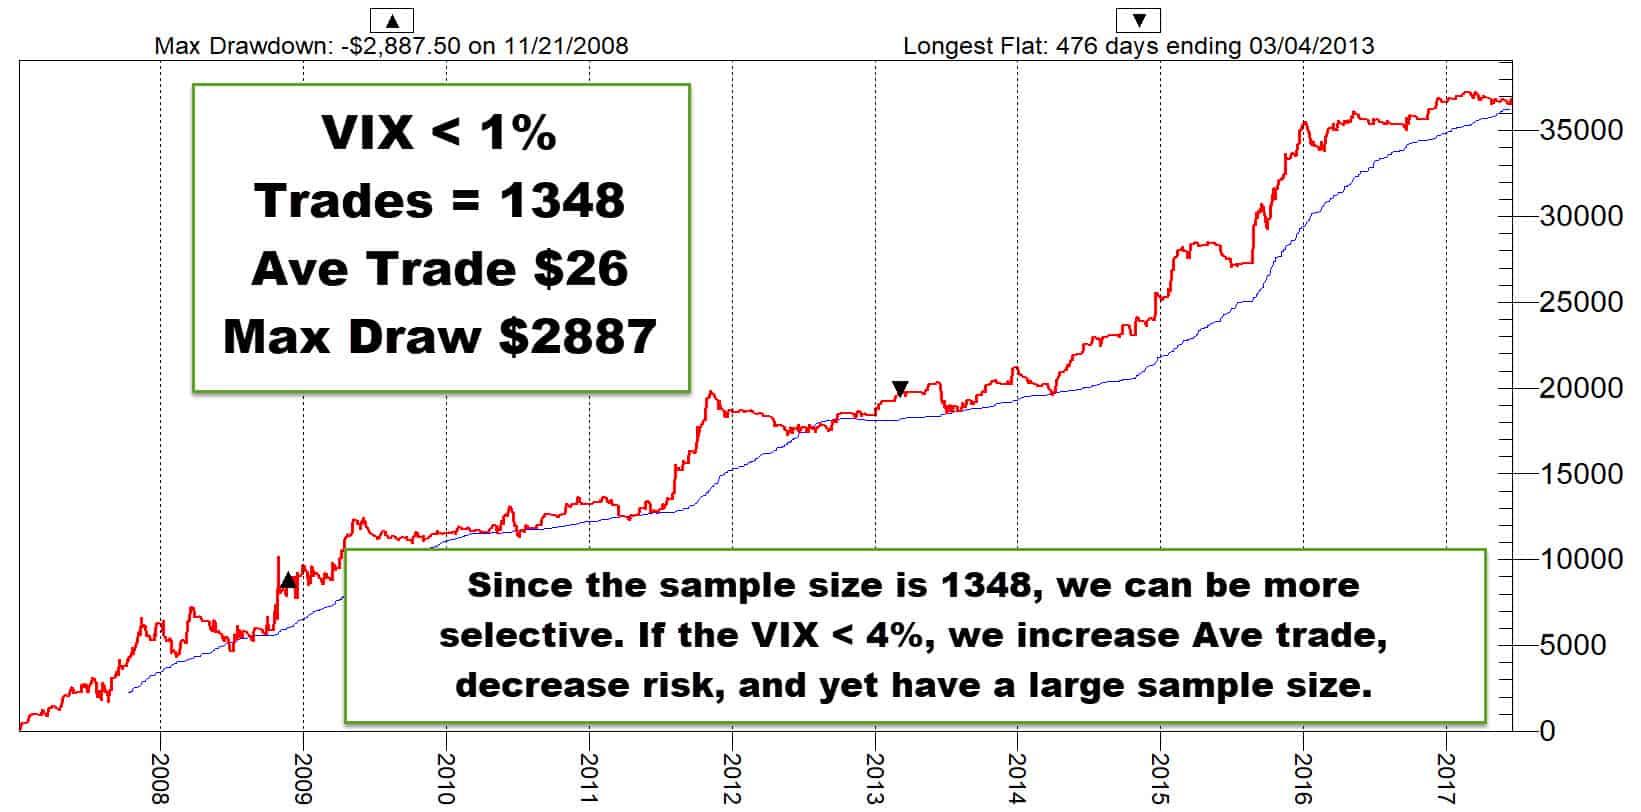 VolatilityTradingIntraday.jpg